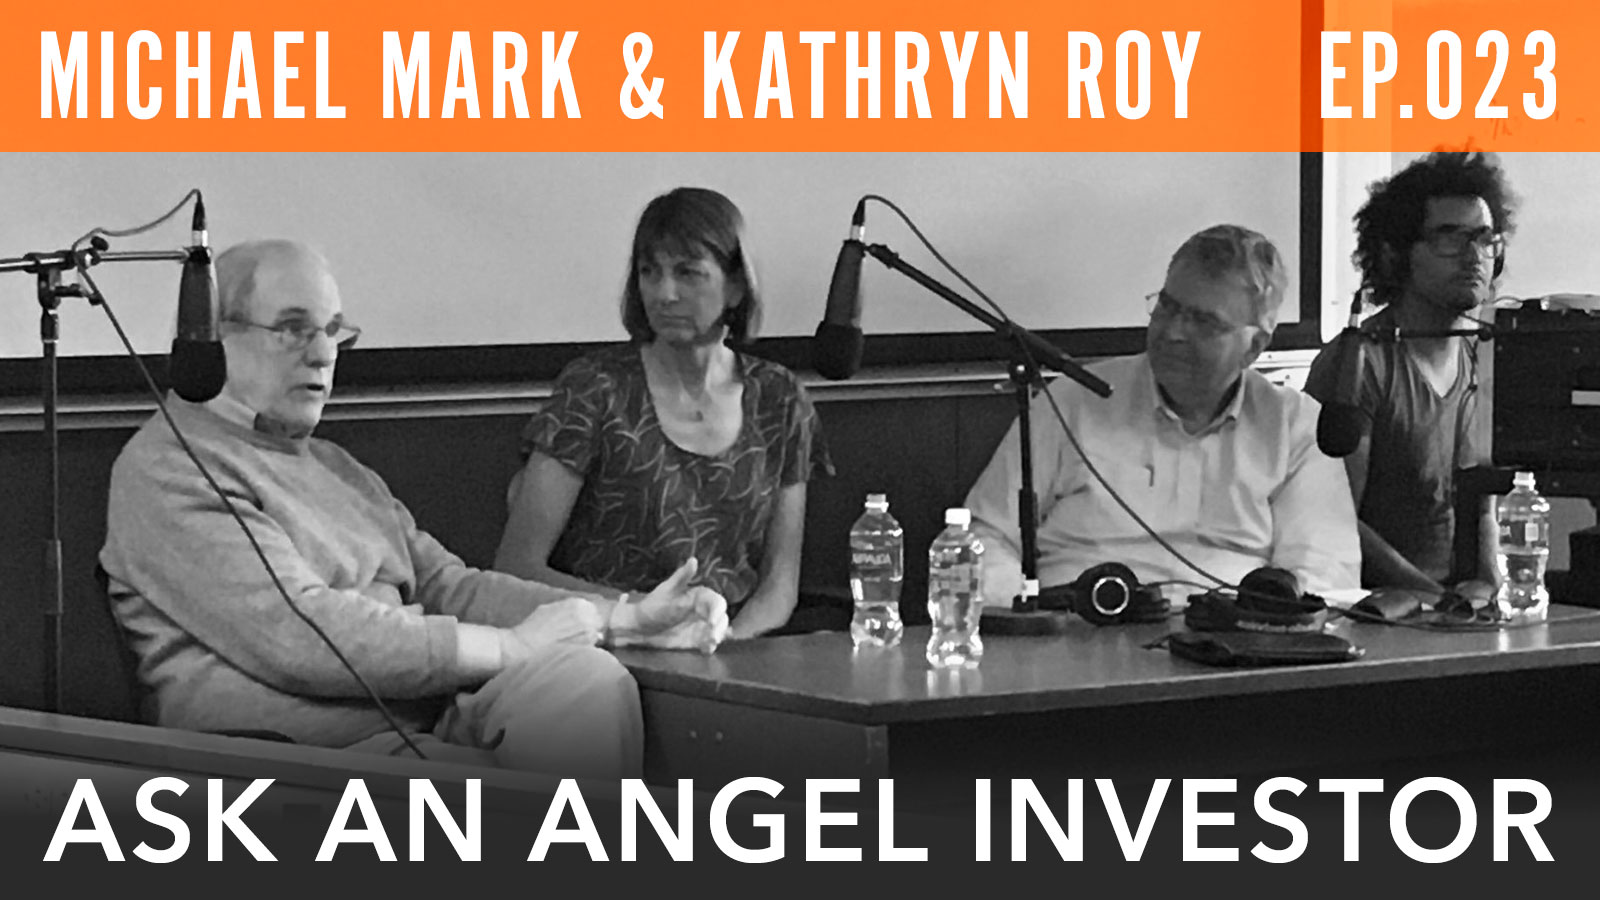 Michael Mark & Kathryn Ro y Ask an Angel Investor I